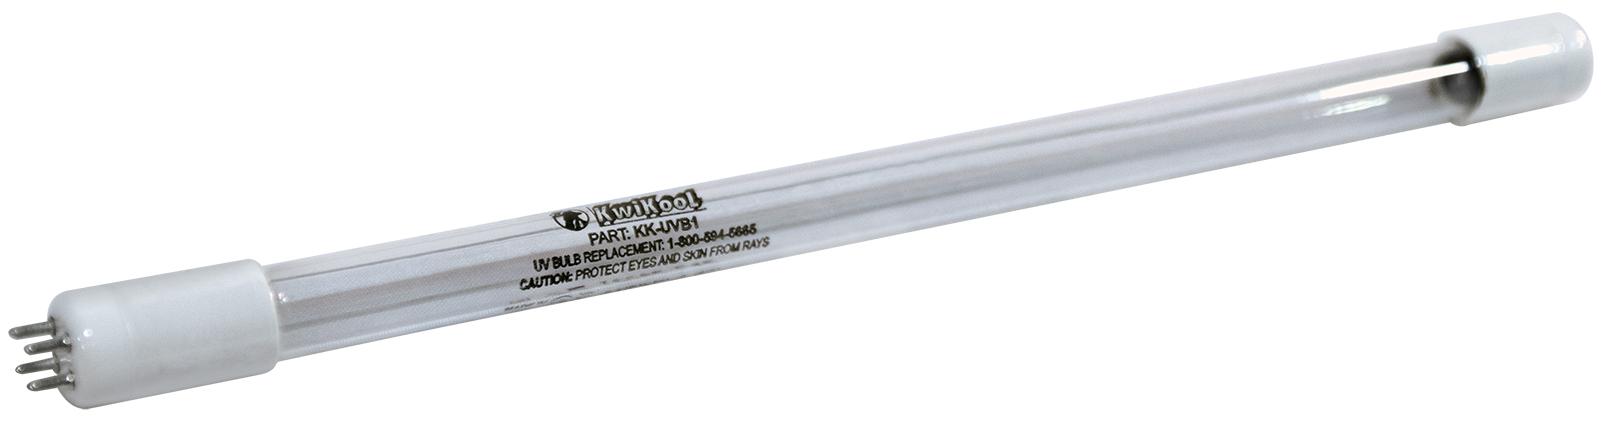 Kwikool KK-UVB1 UV Replacement Light for KBIO Series